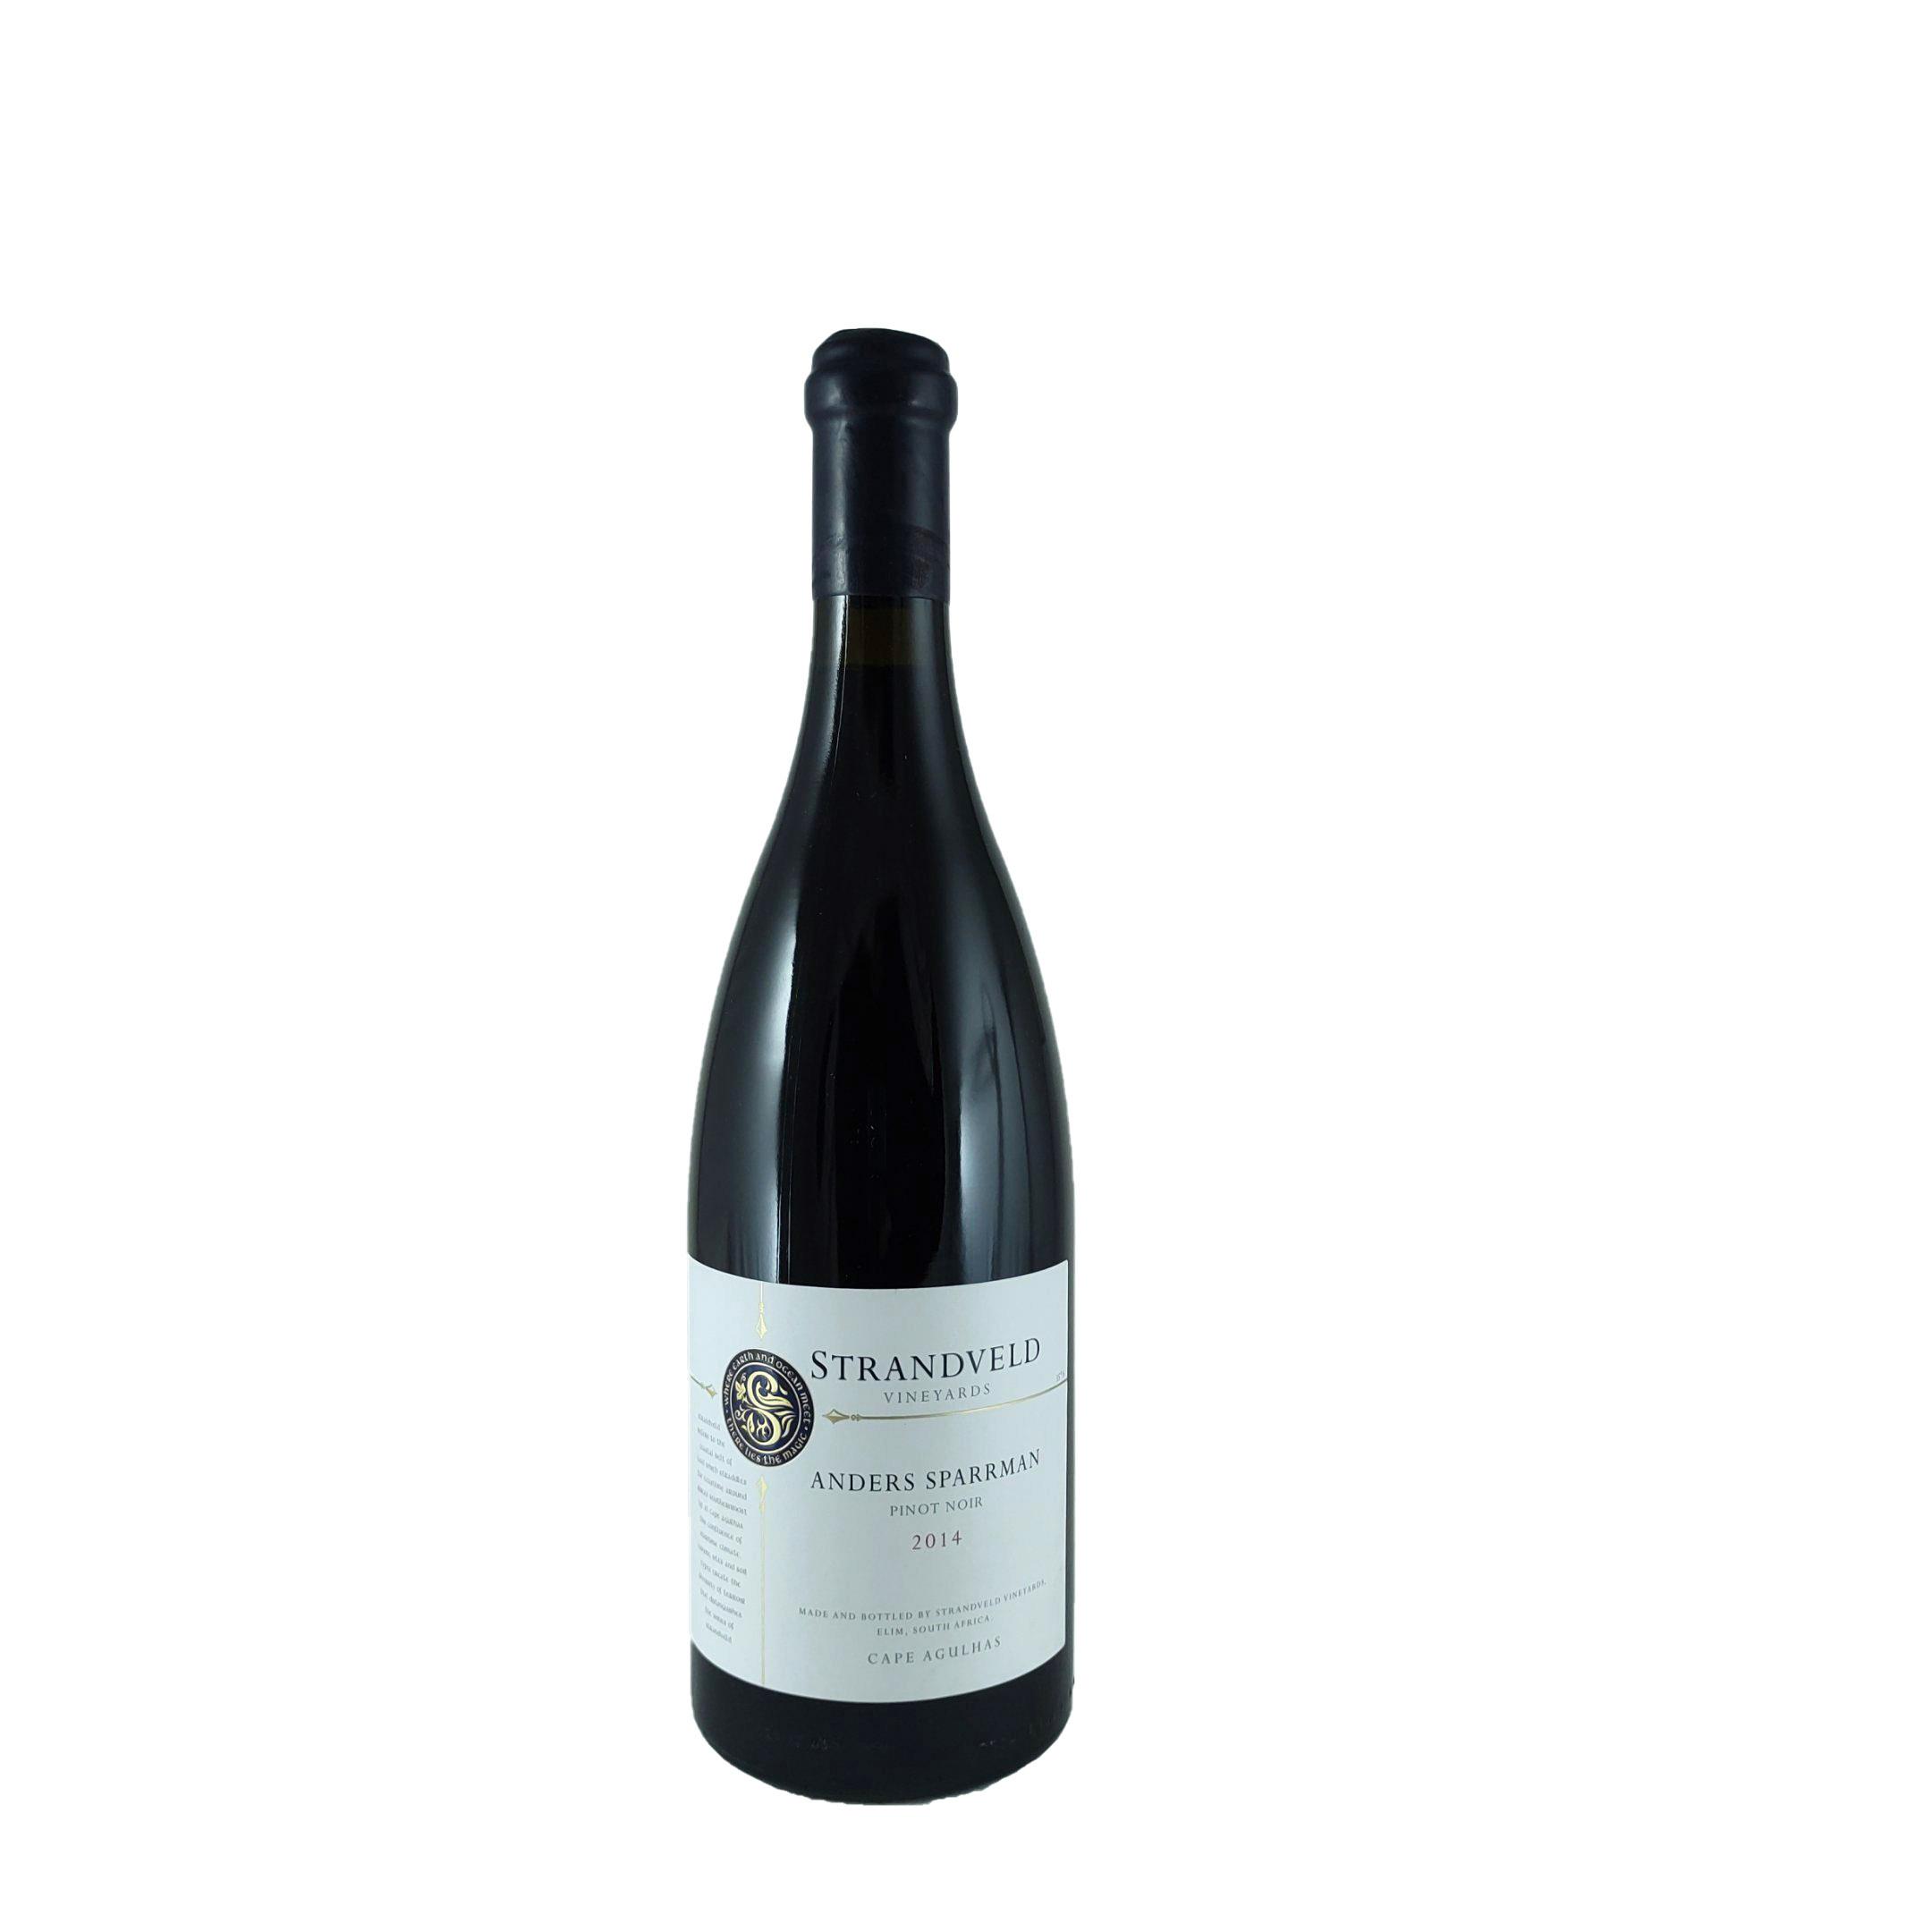 Strandveld – Anders Sparrman Pinot Noir 2014